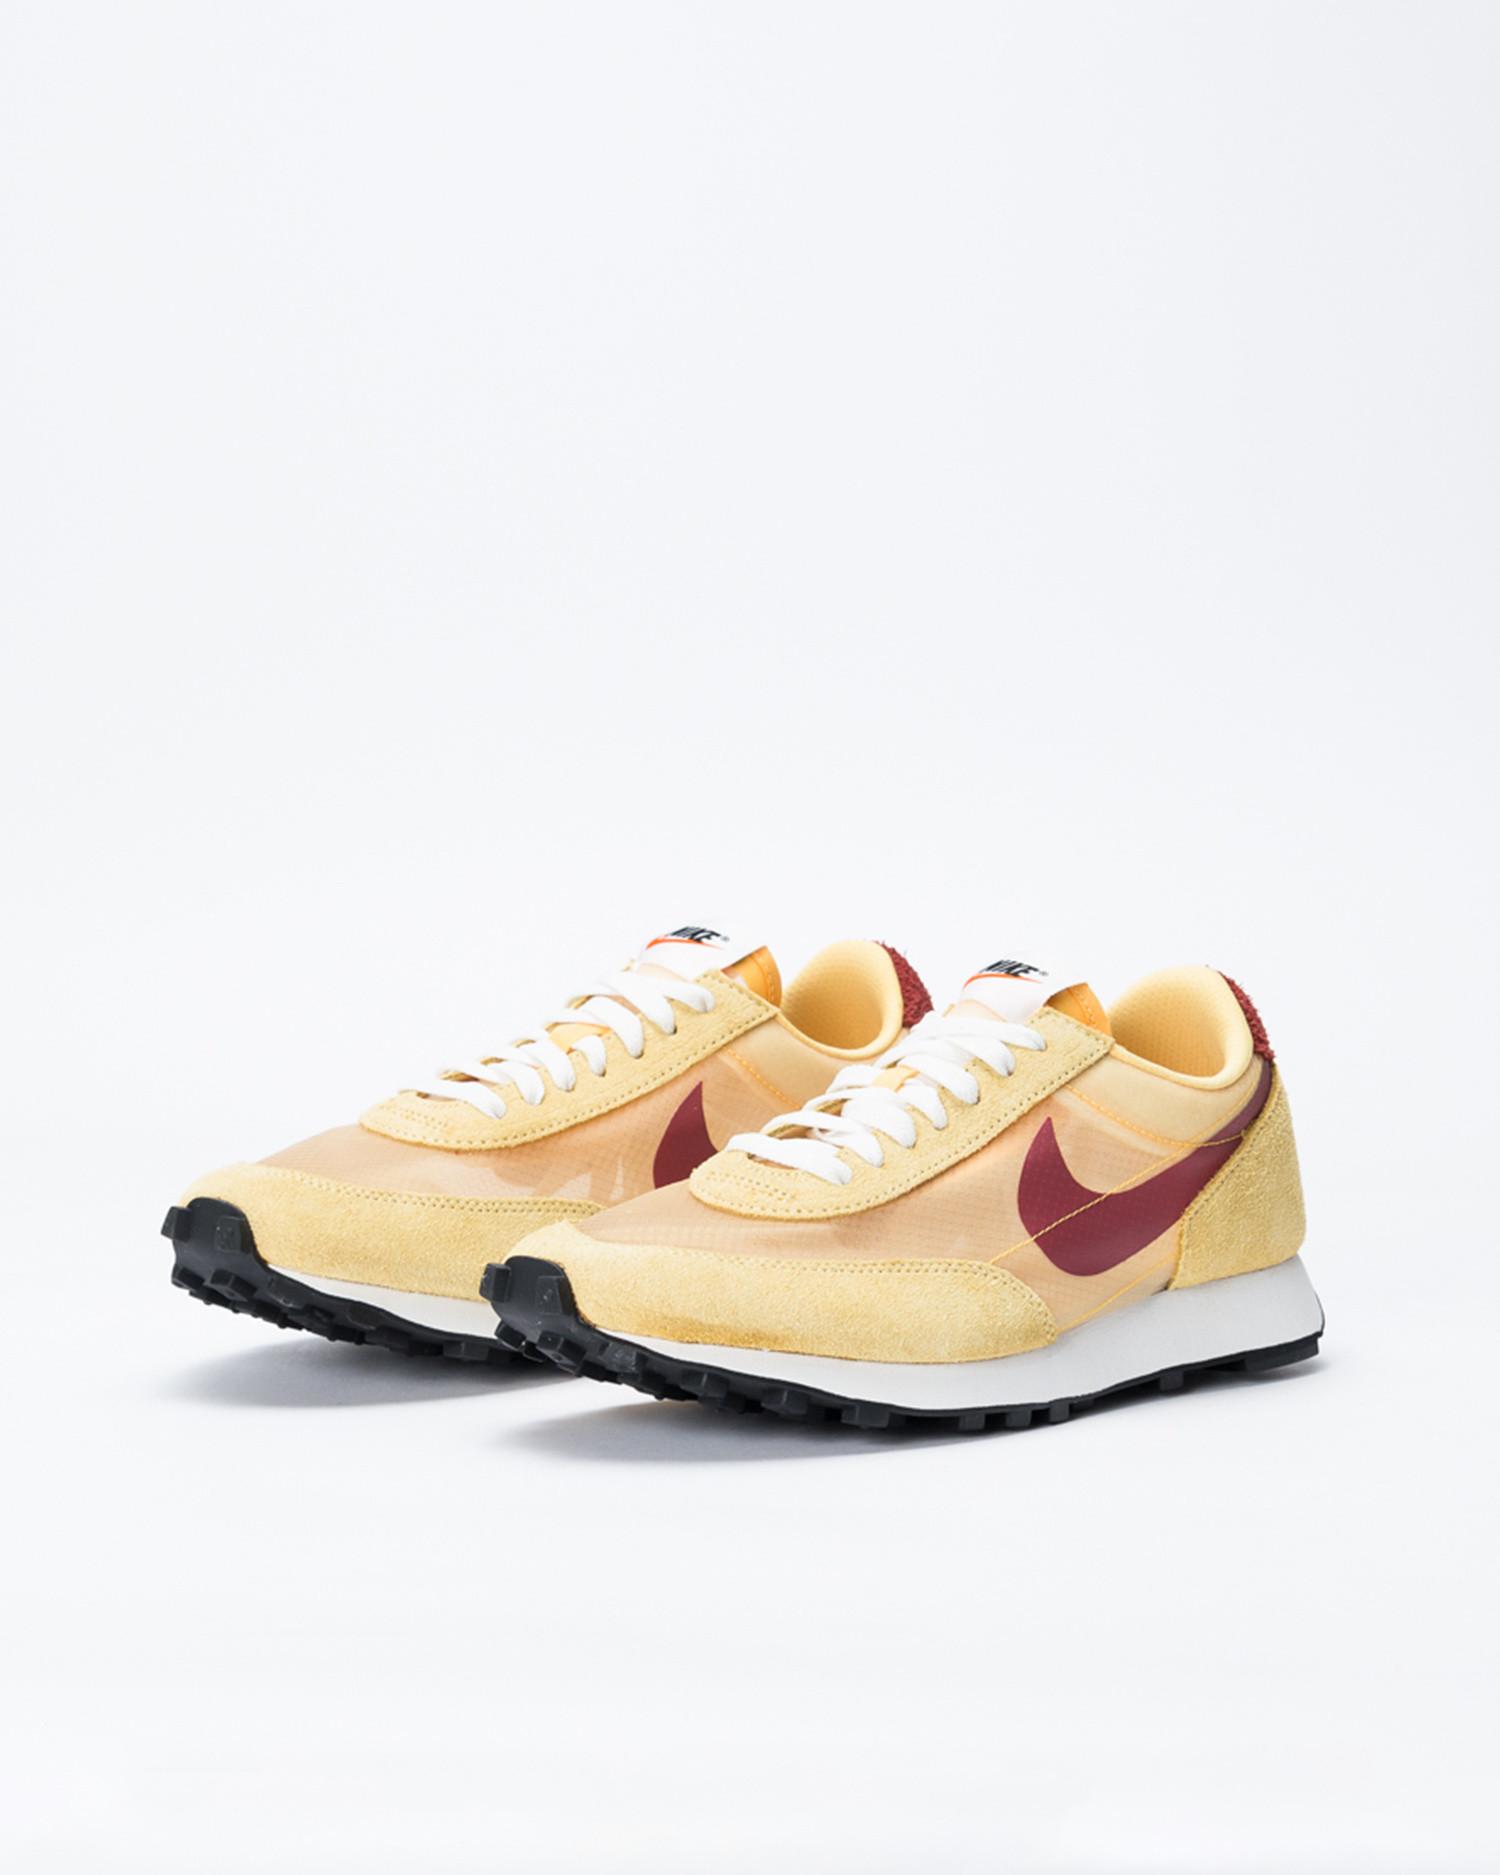 Nike Daybreak sp Topaz gold/cedar-lemon wash-summit white